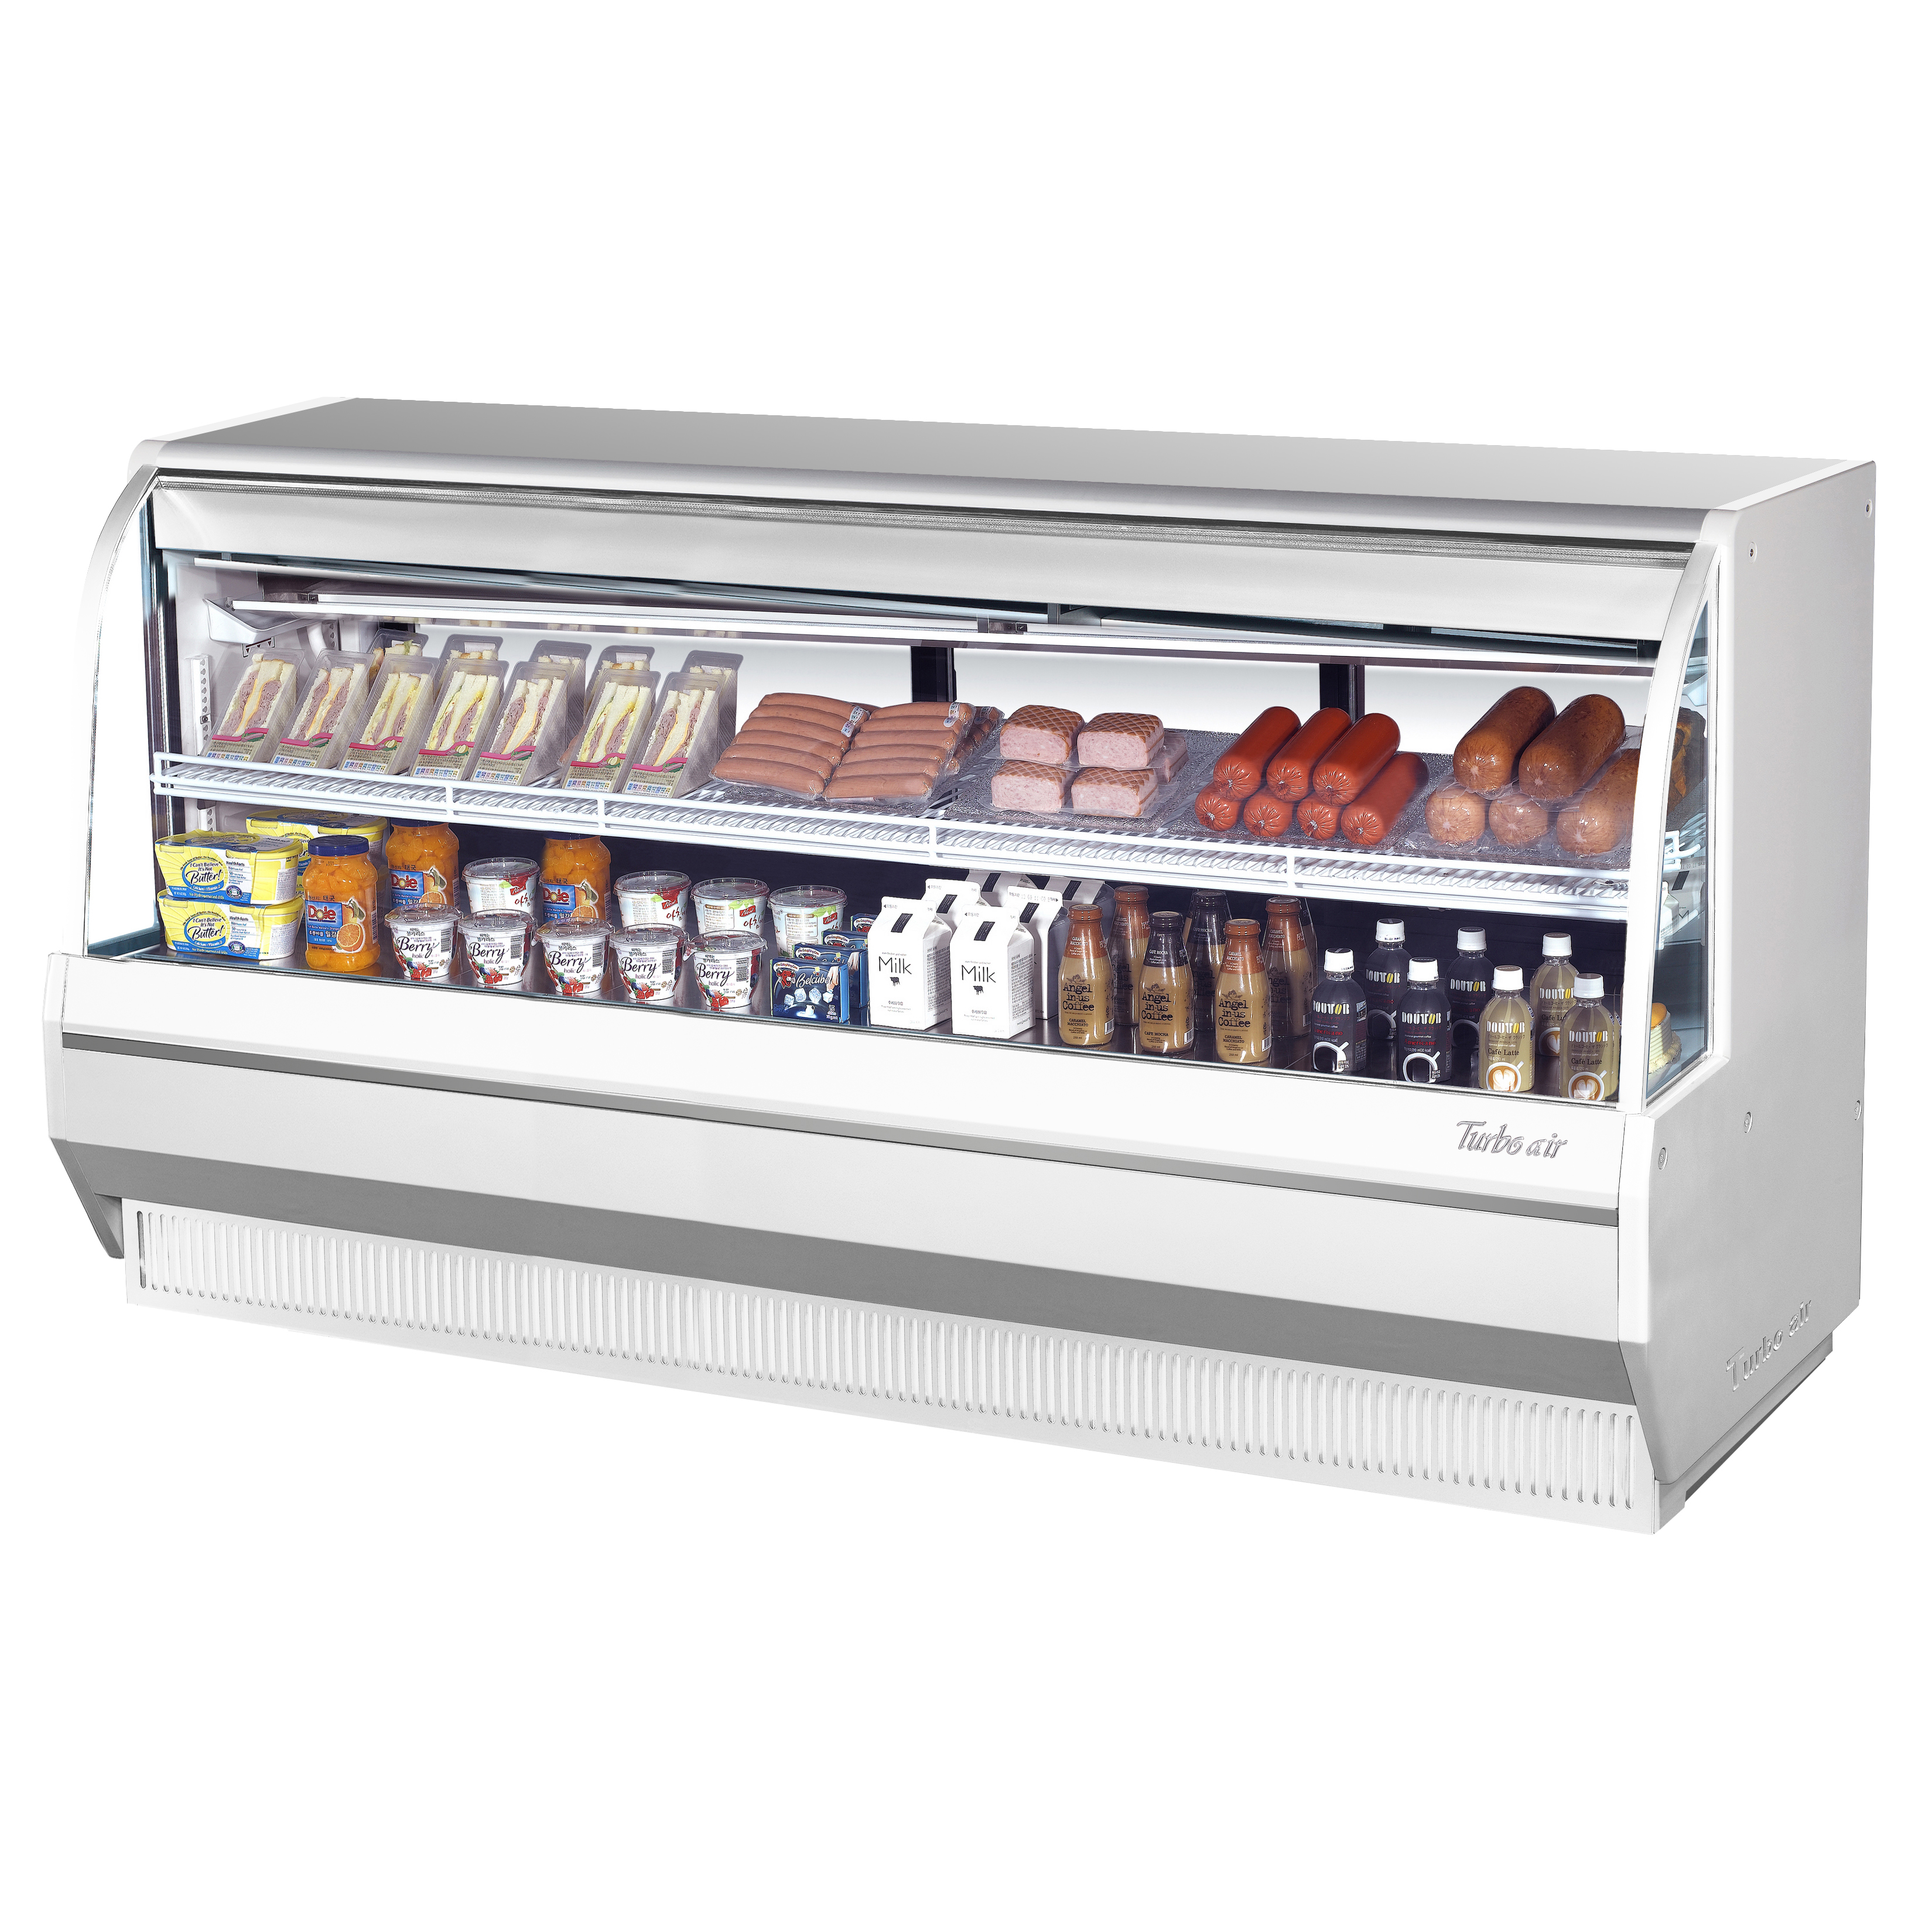 Turbo Air TCDD-96L-W(B)-N display case, refrigerated deli